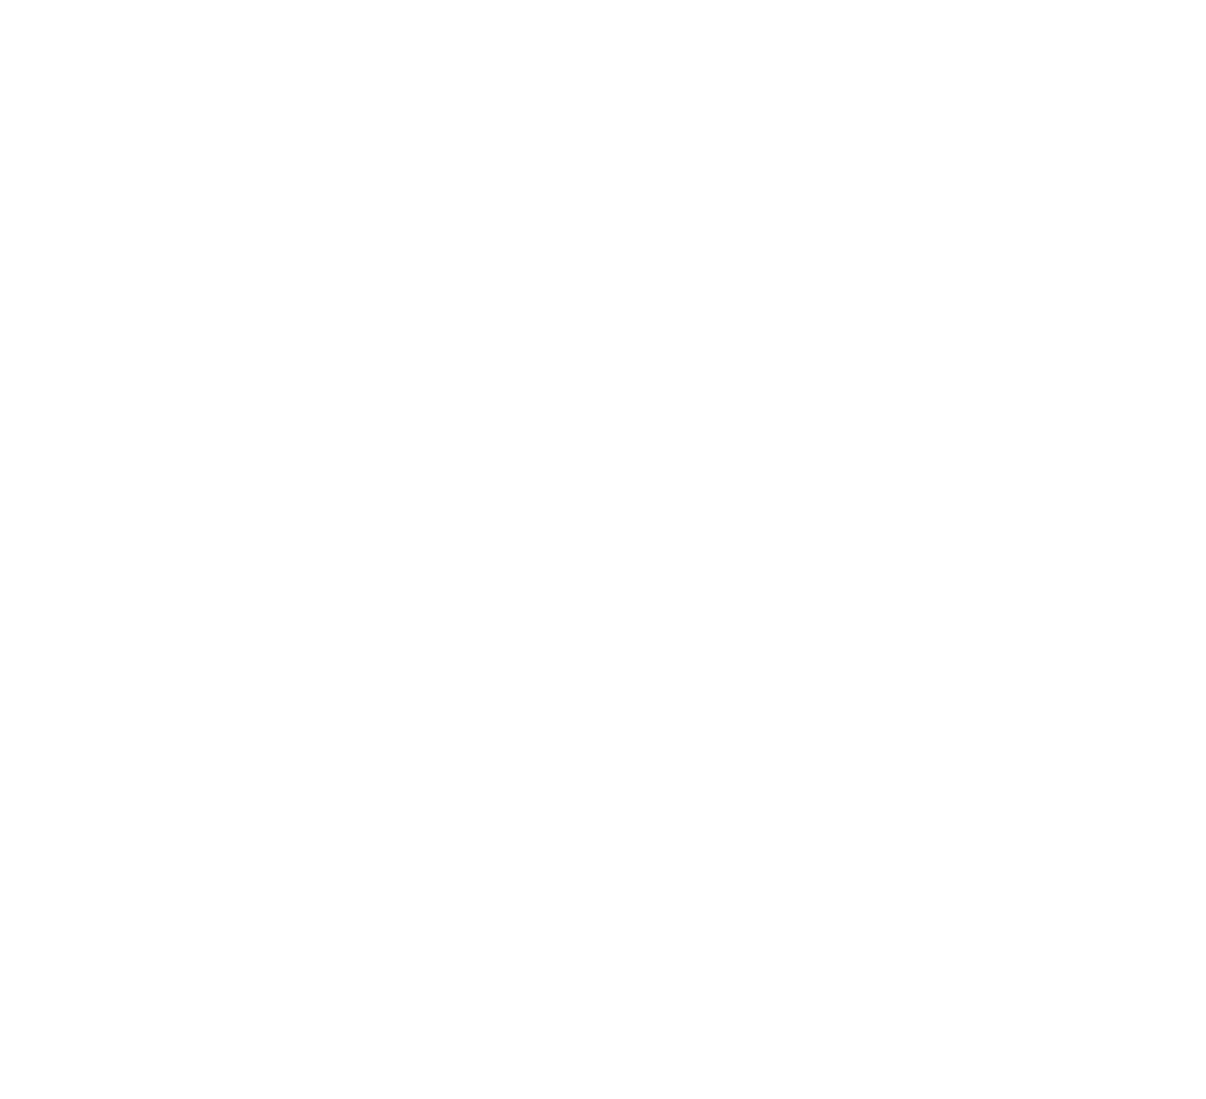 3DScan – Smart Surveying